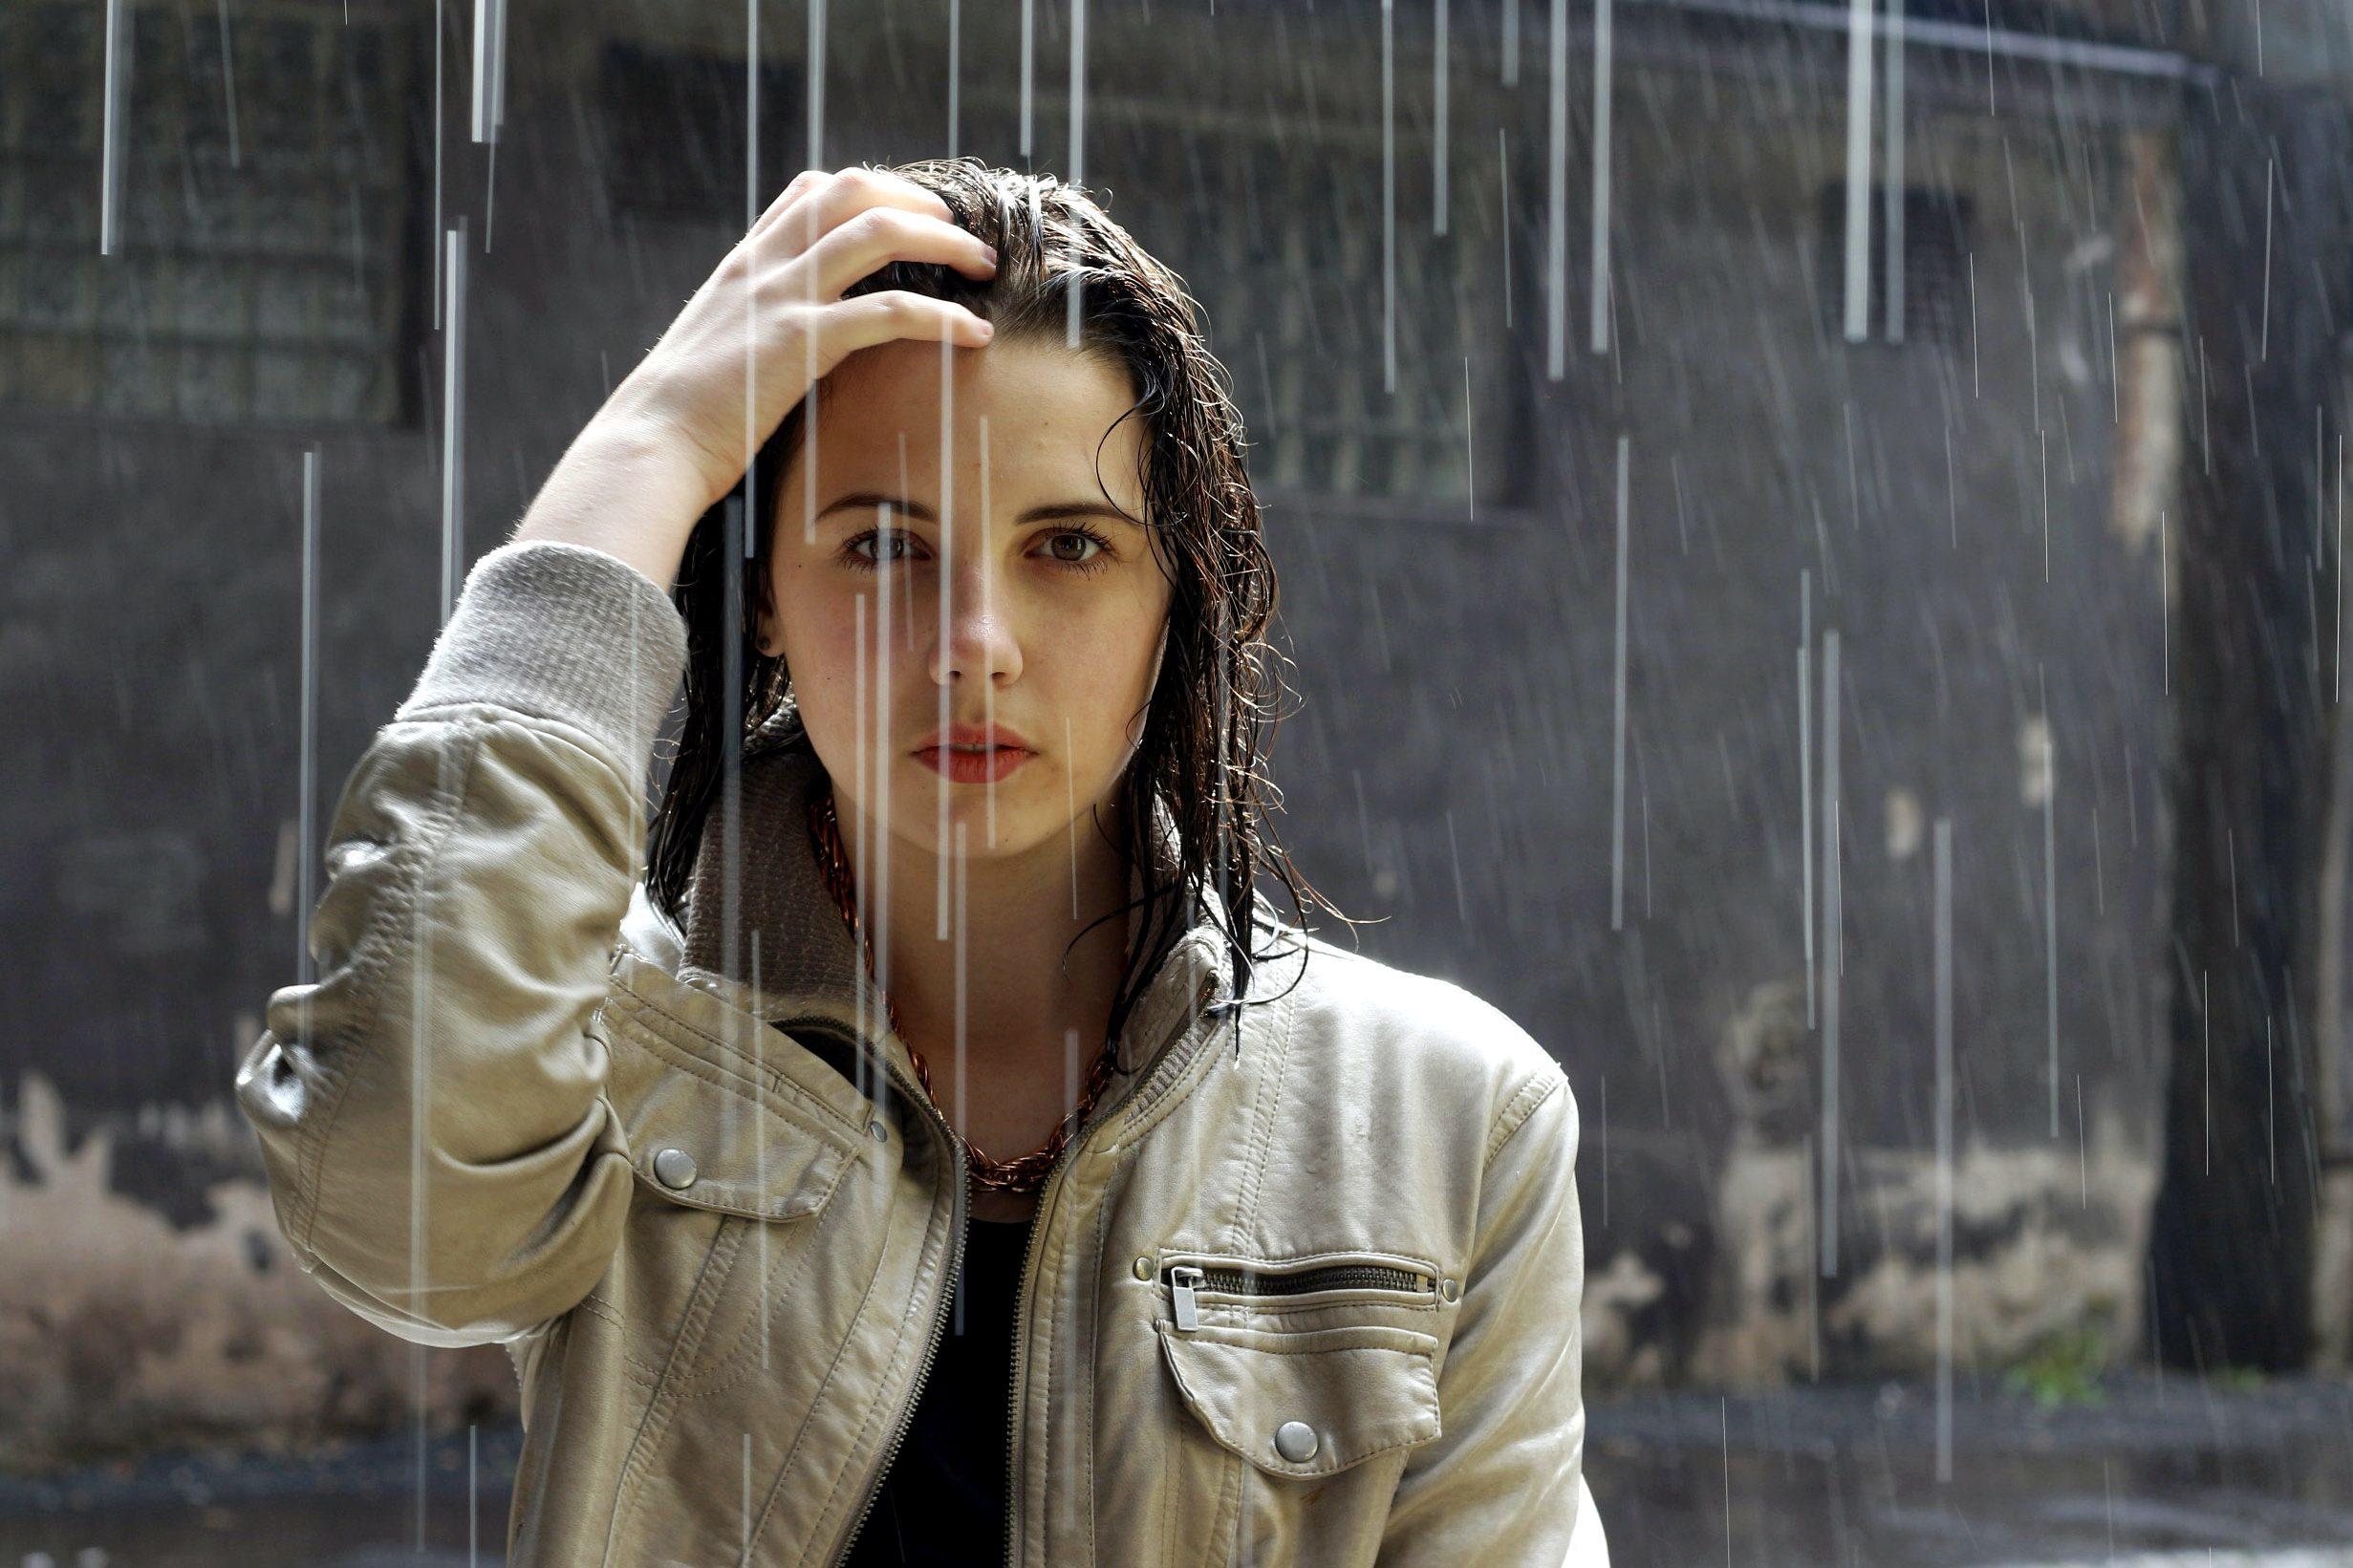 Smiling Caucasian woman standing in rain - Stock Photo